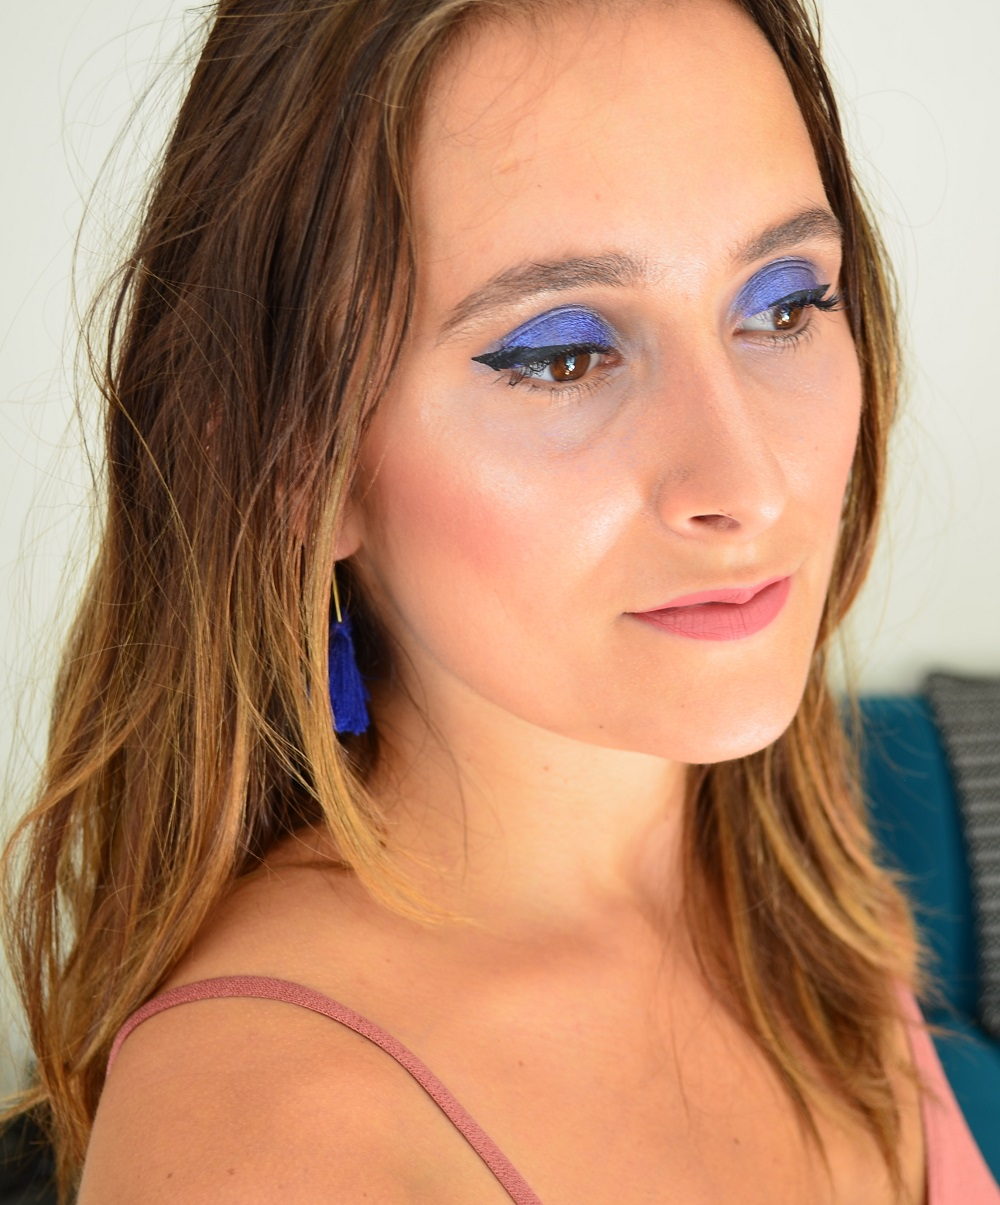 Maquillage bio bleu et vieux rose